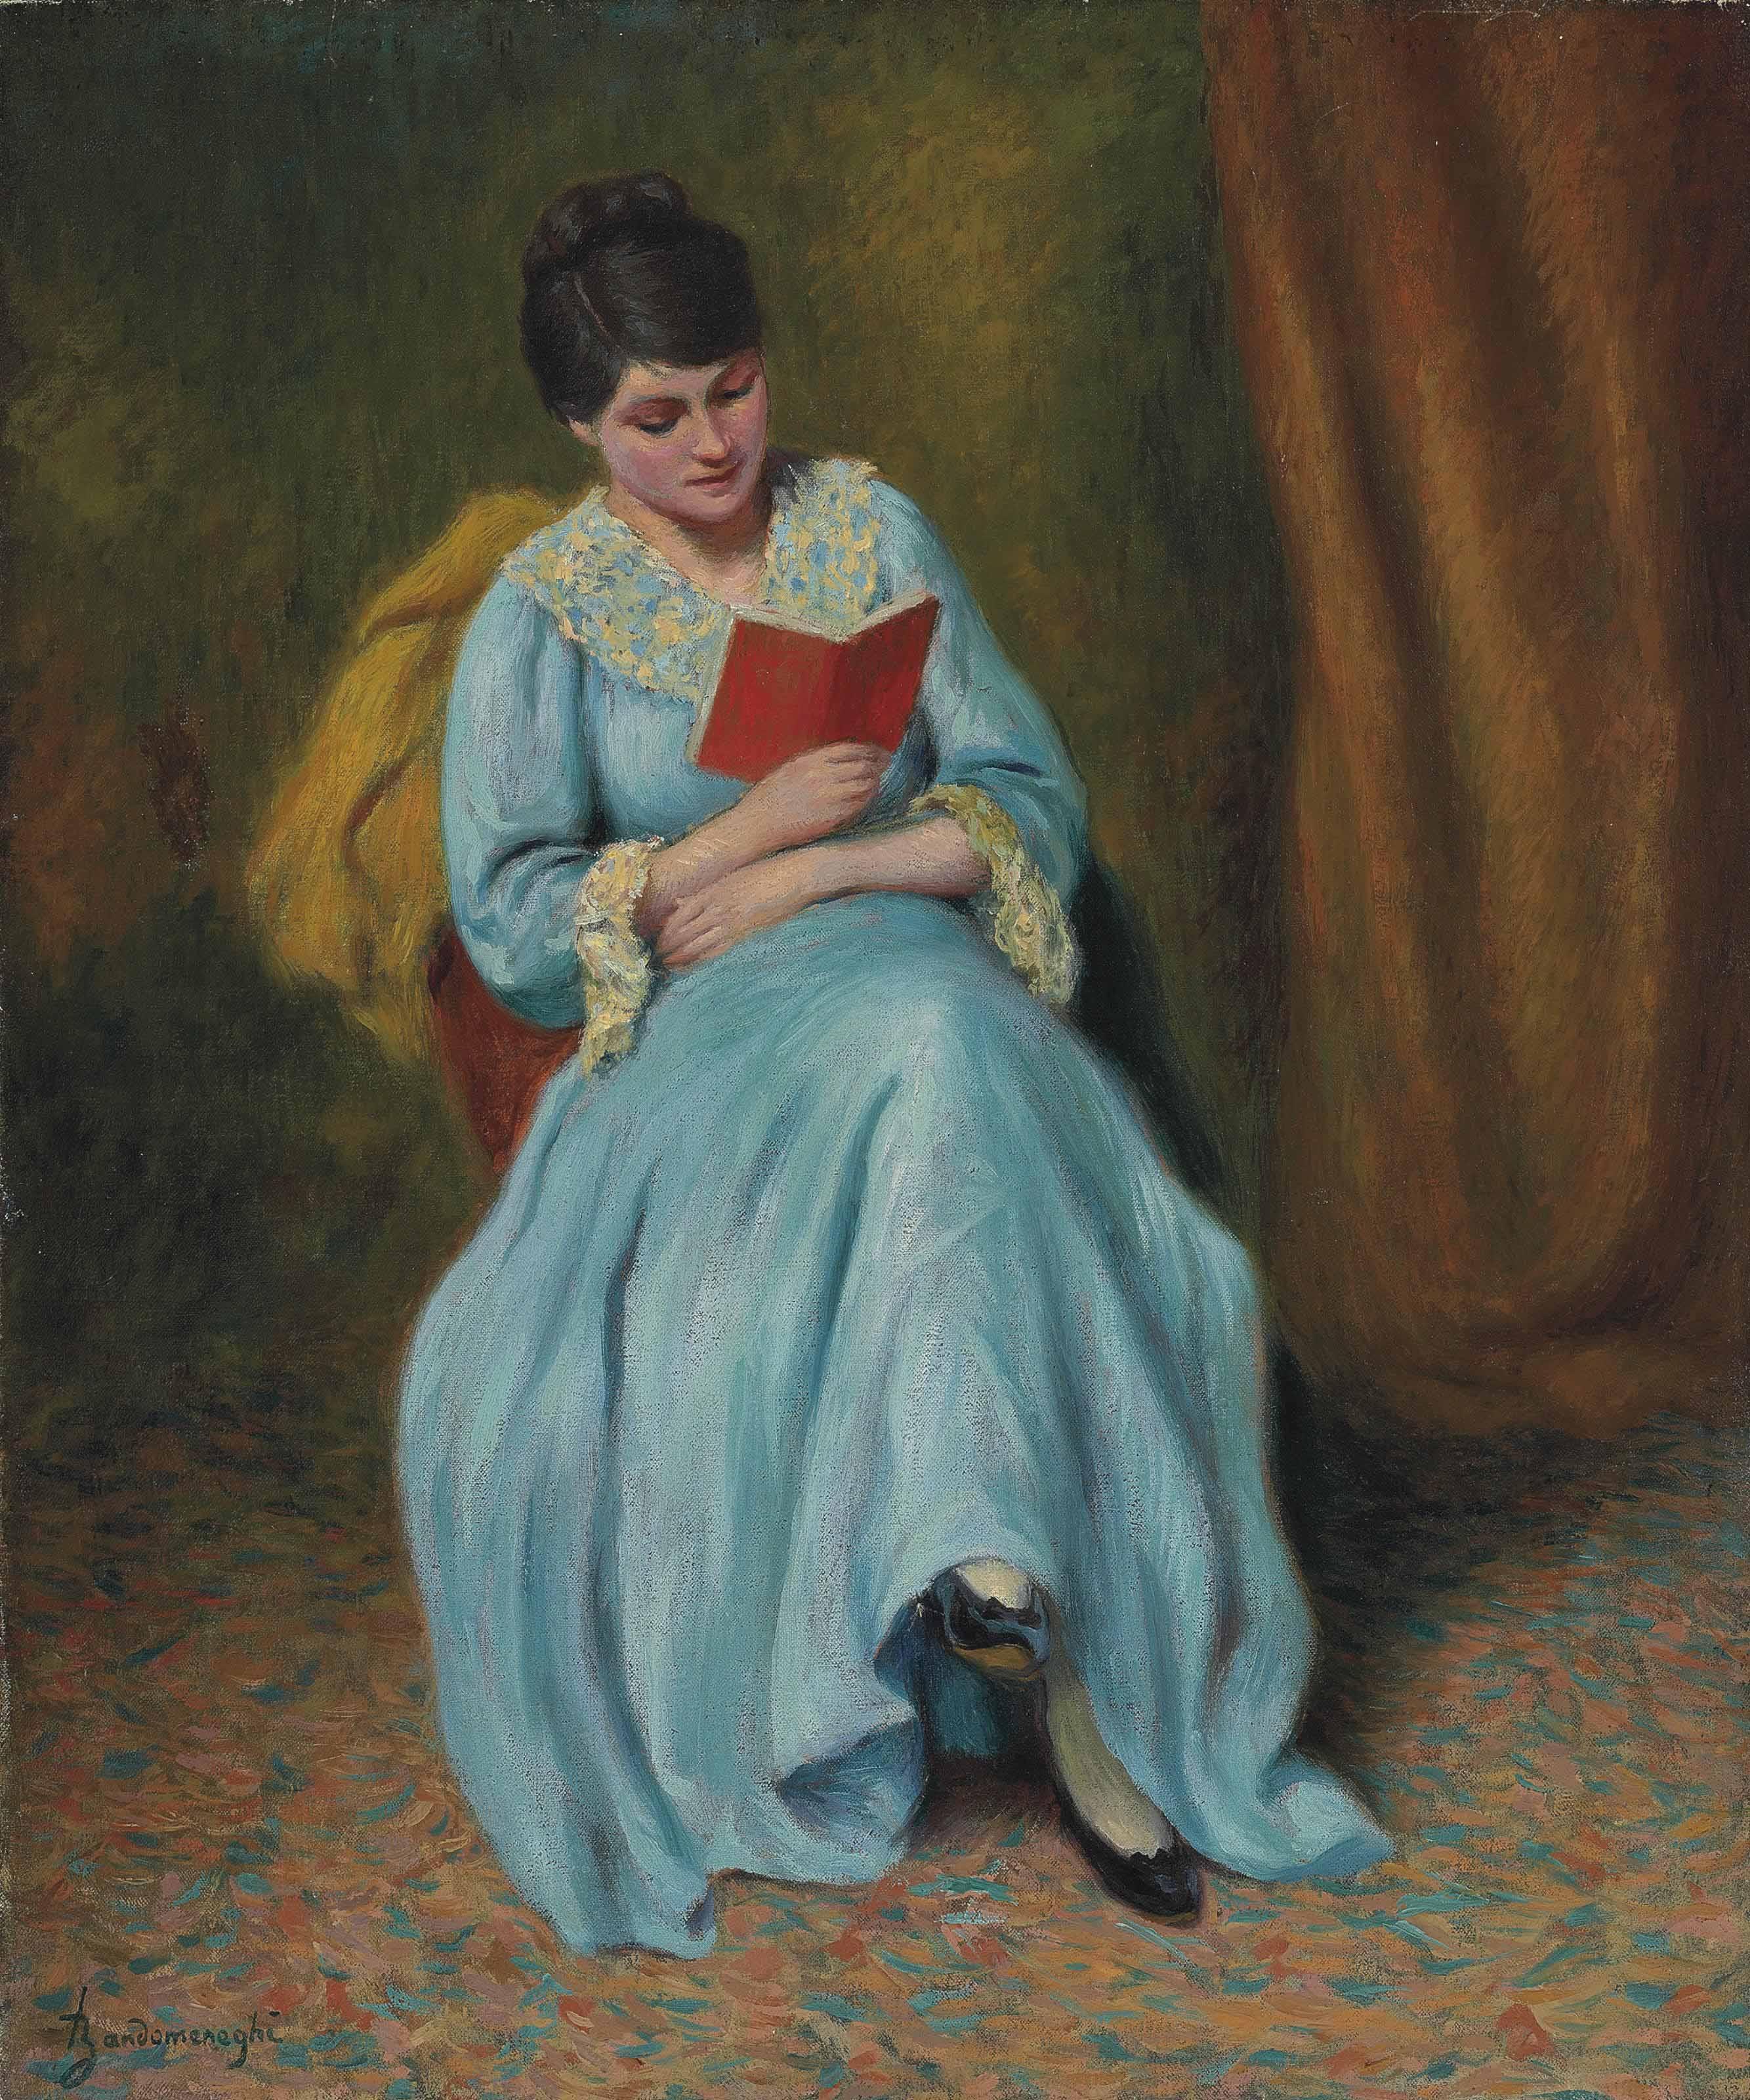 Femme en bleu qui lit